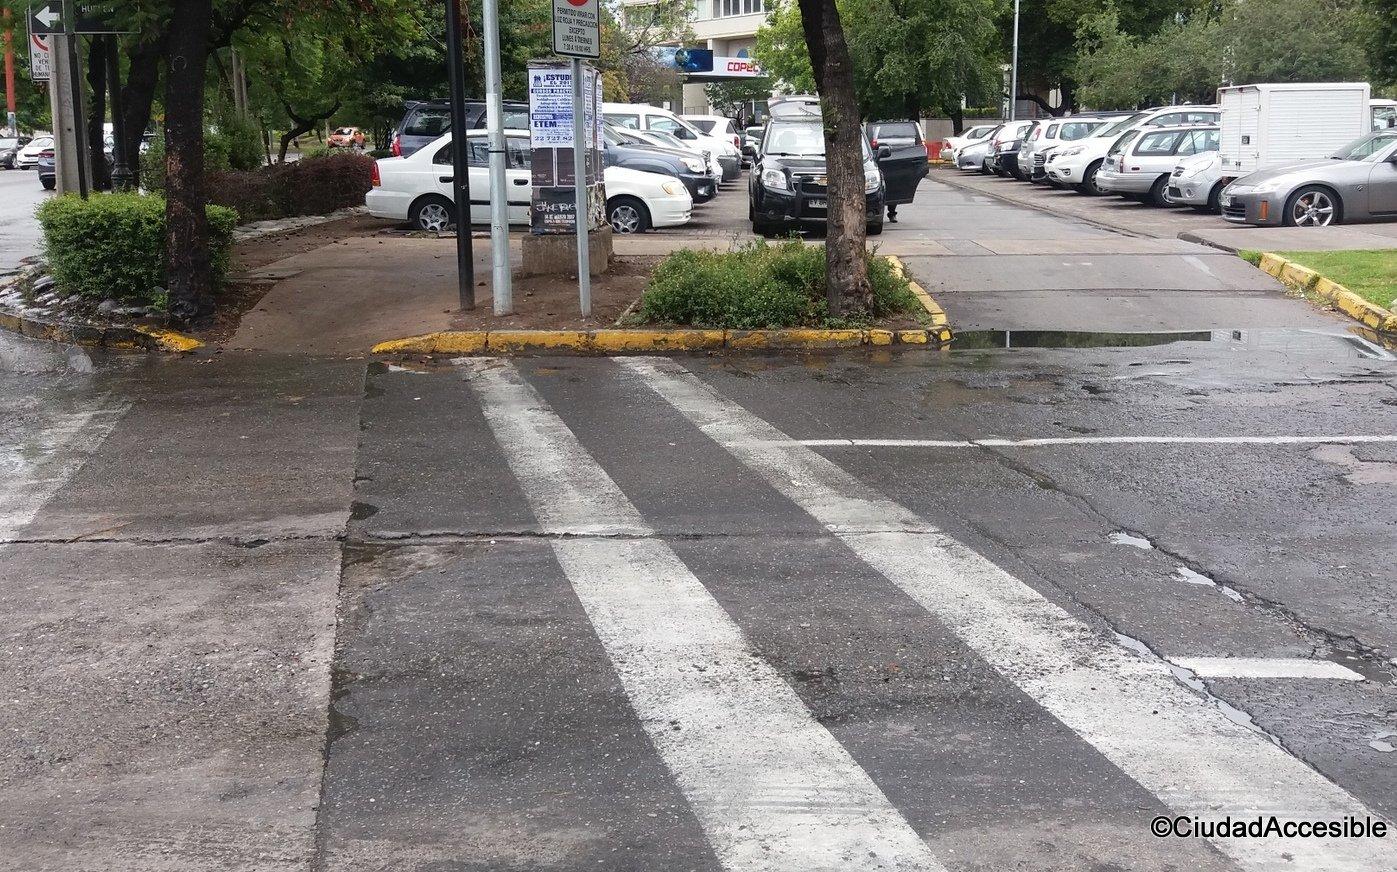 cruce peatonal alternativo al 42 k sin rebajes